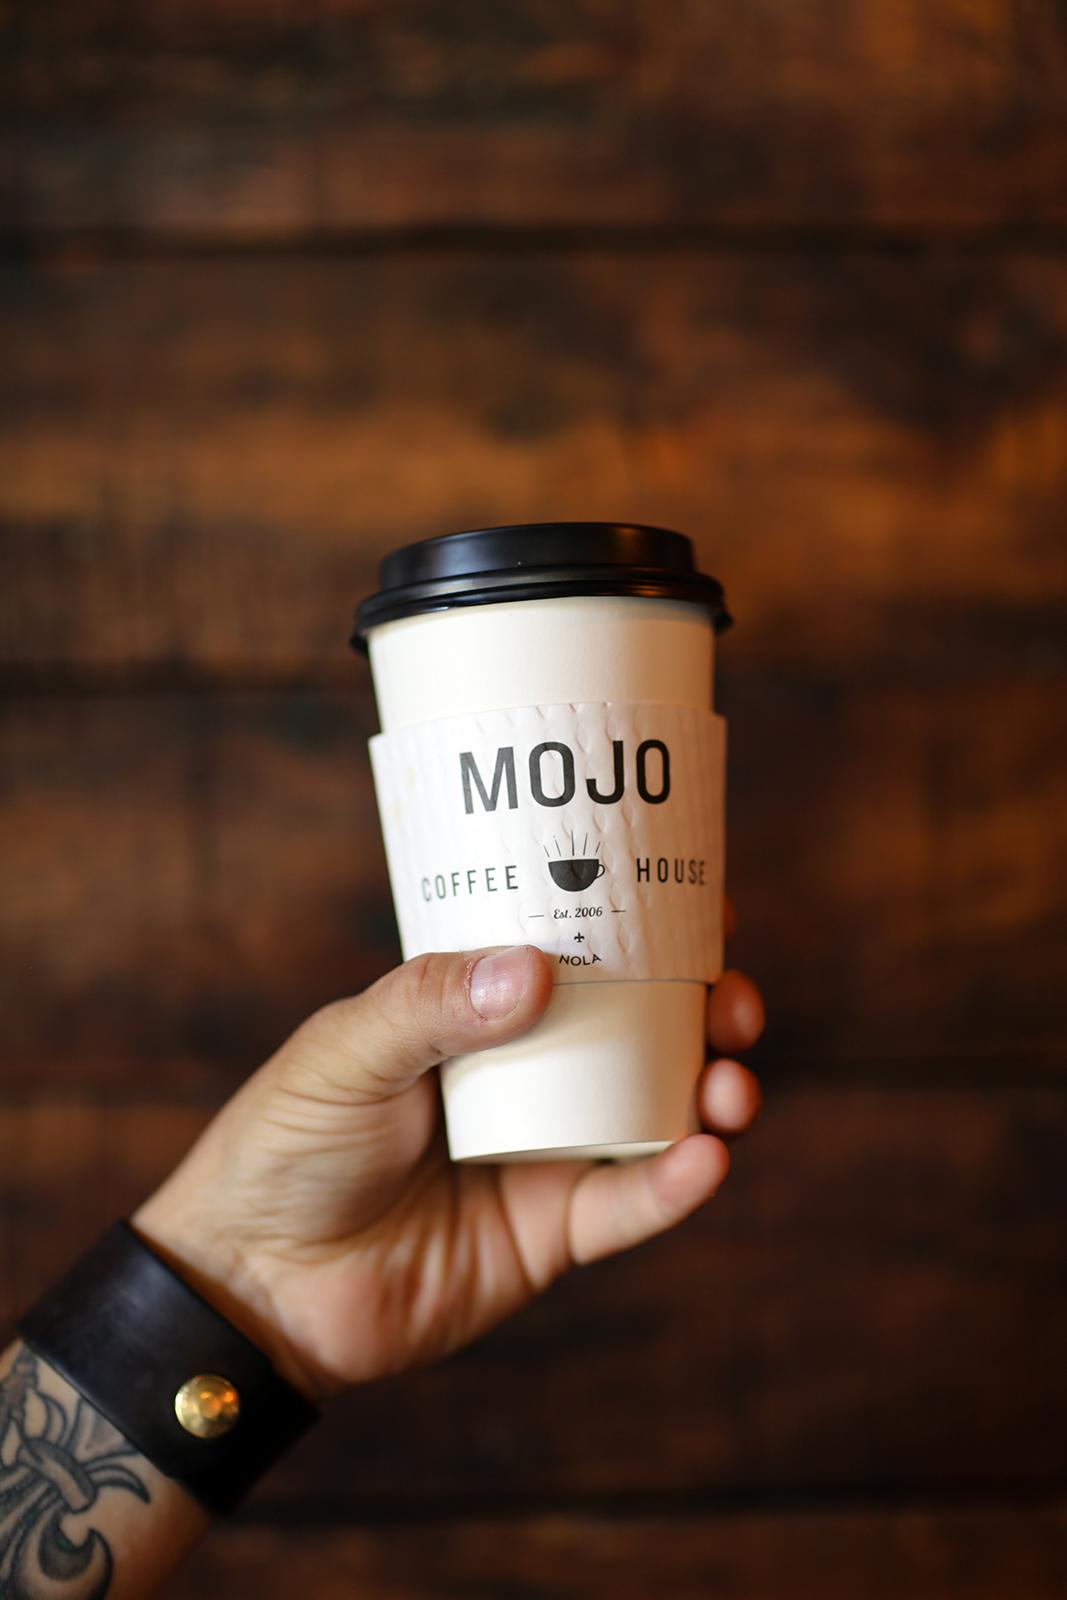 mojo-coffee-cup-in-hand.jpg